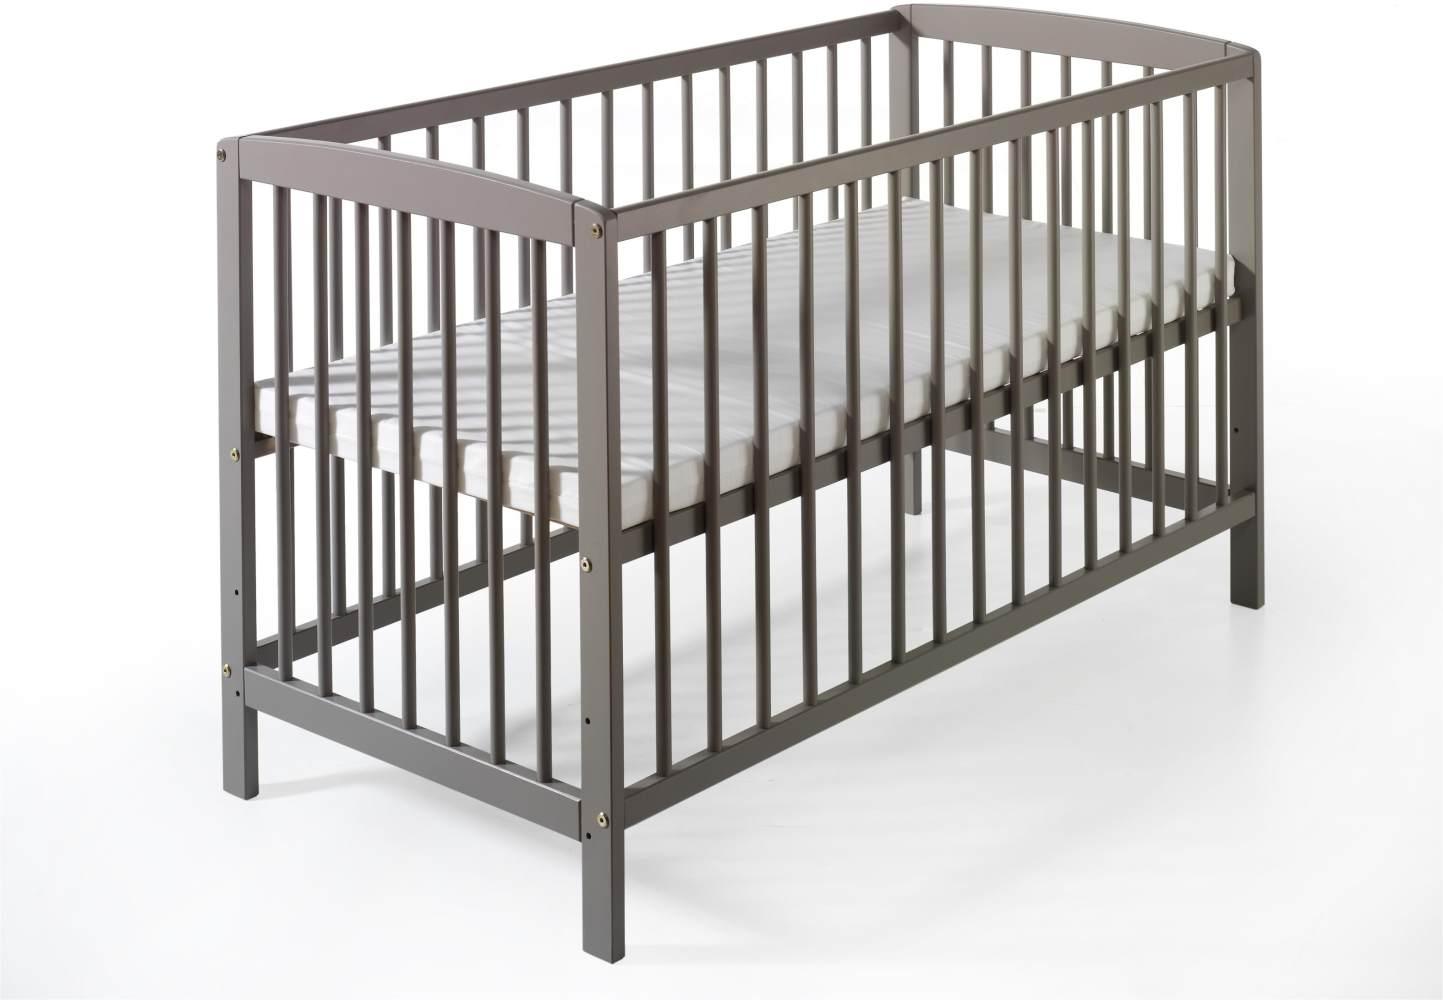 Schardt 'Felix' Kinderbett grau lackiert Bild 1